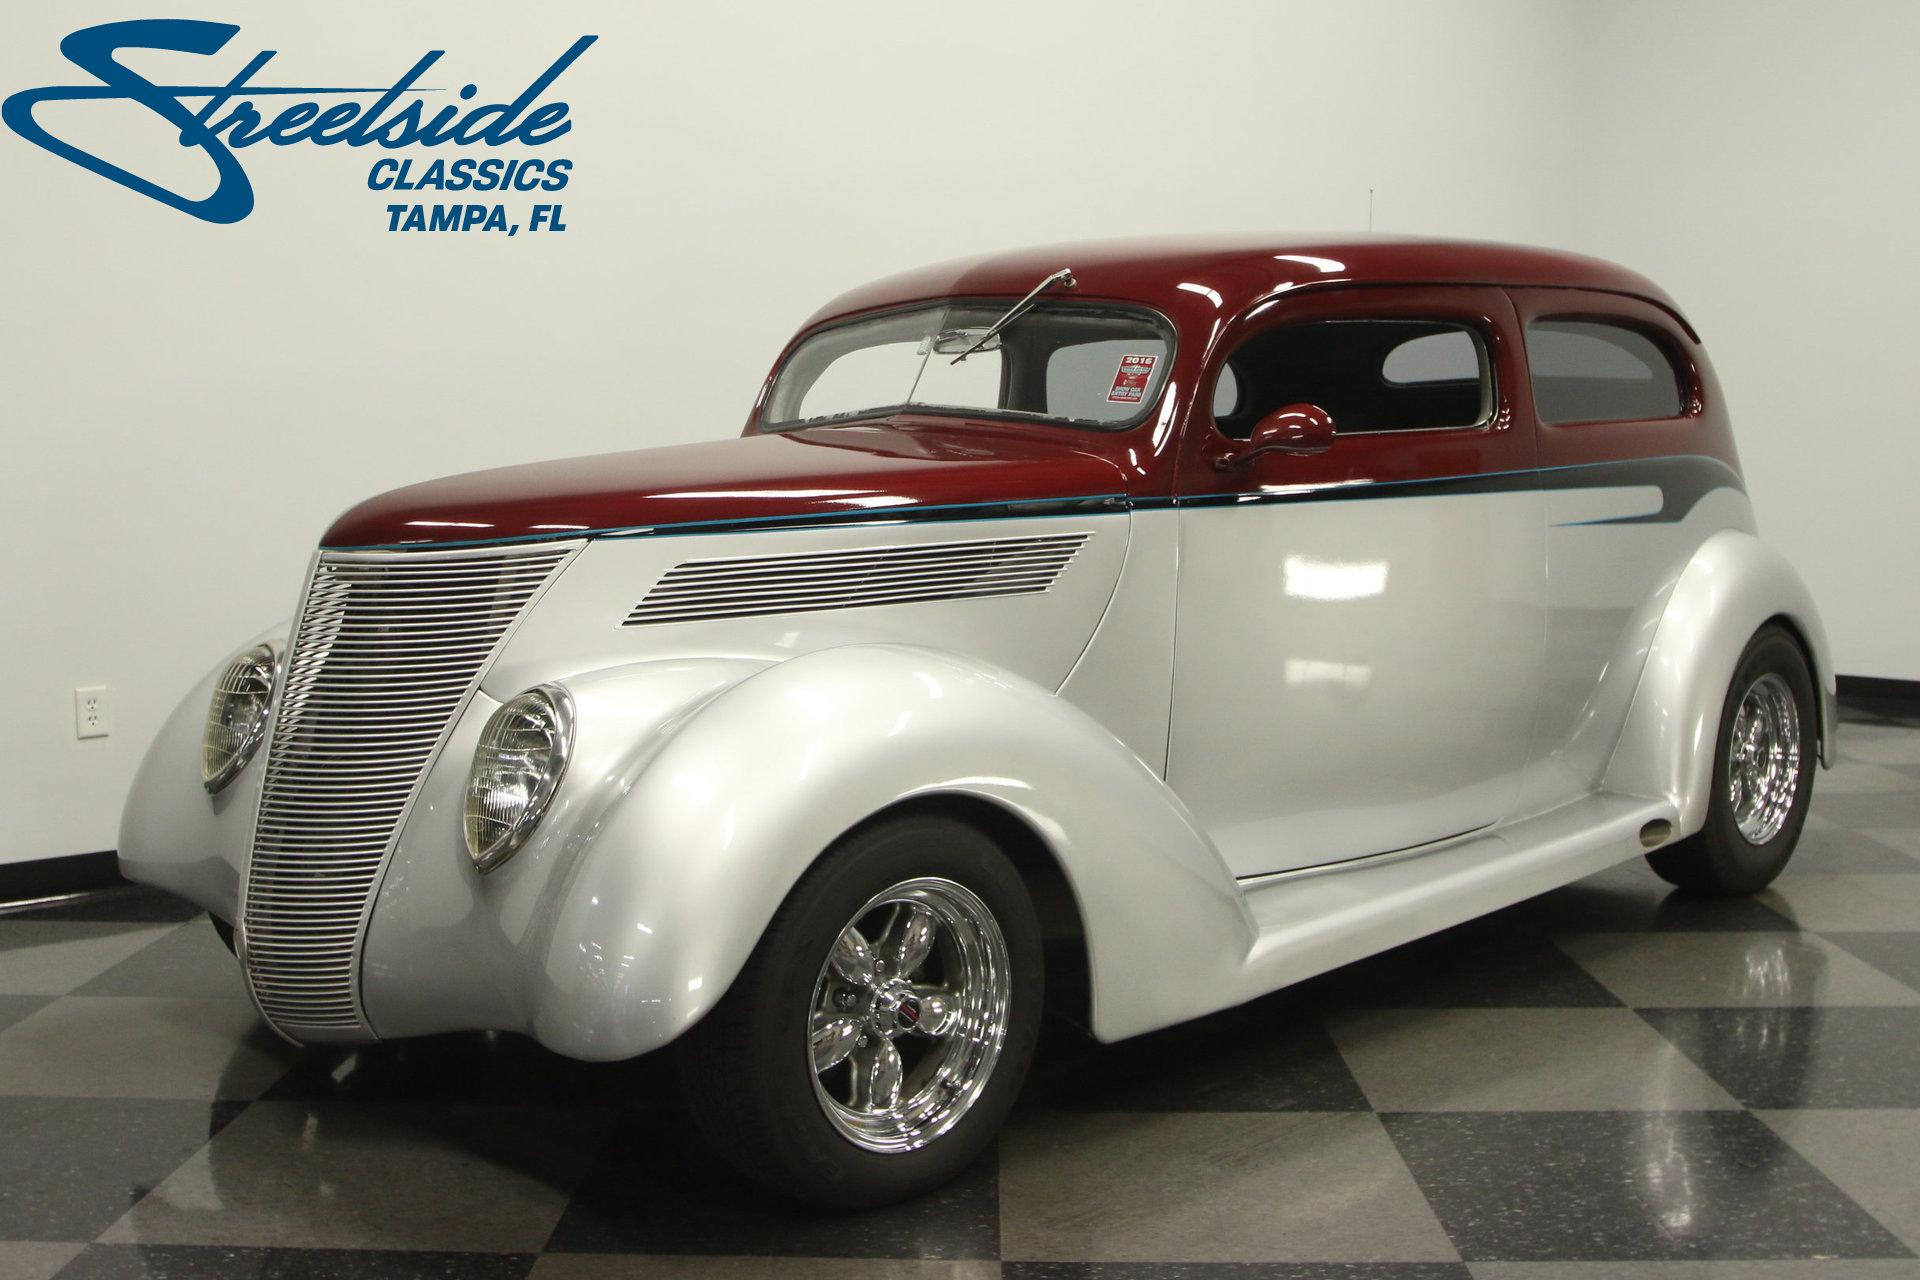 1937 ford 2 door sedan streetside classics classic for 1937 ford 2 door sedan for sale